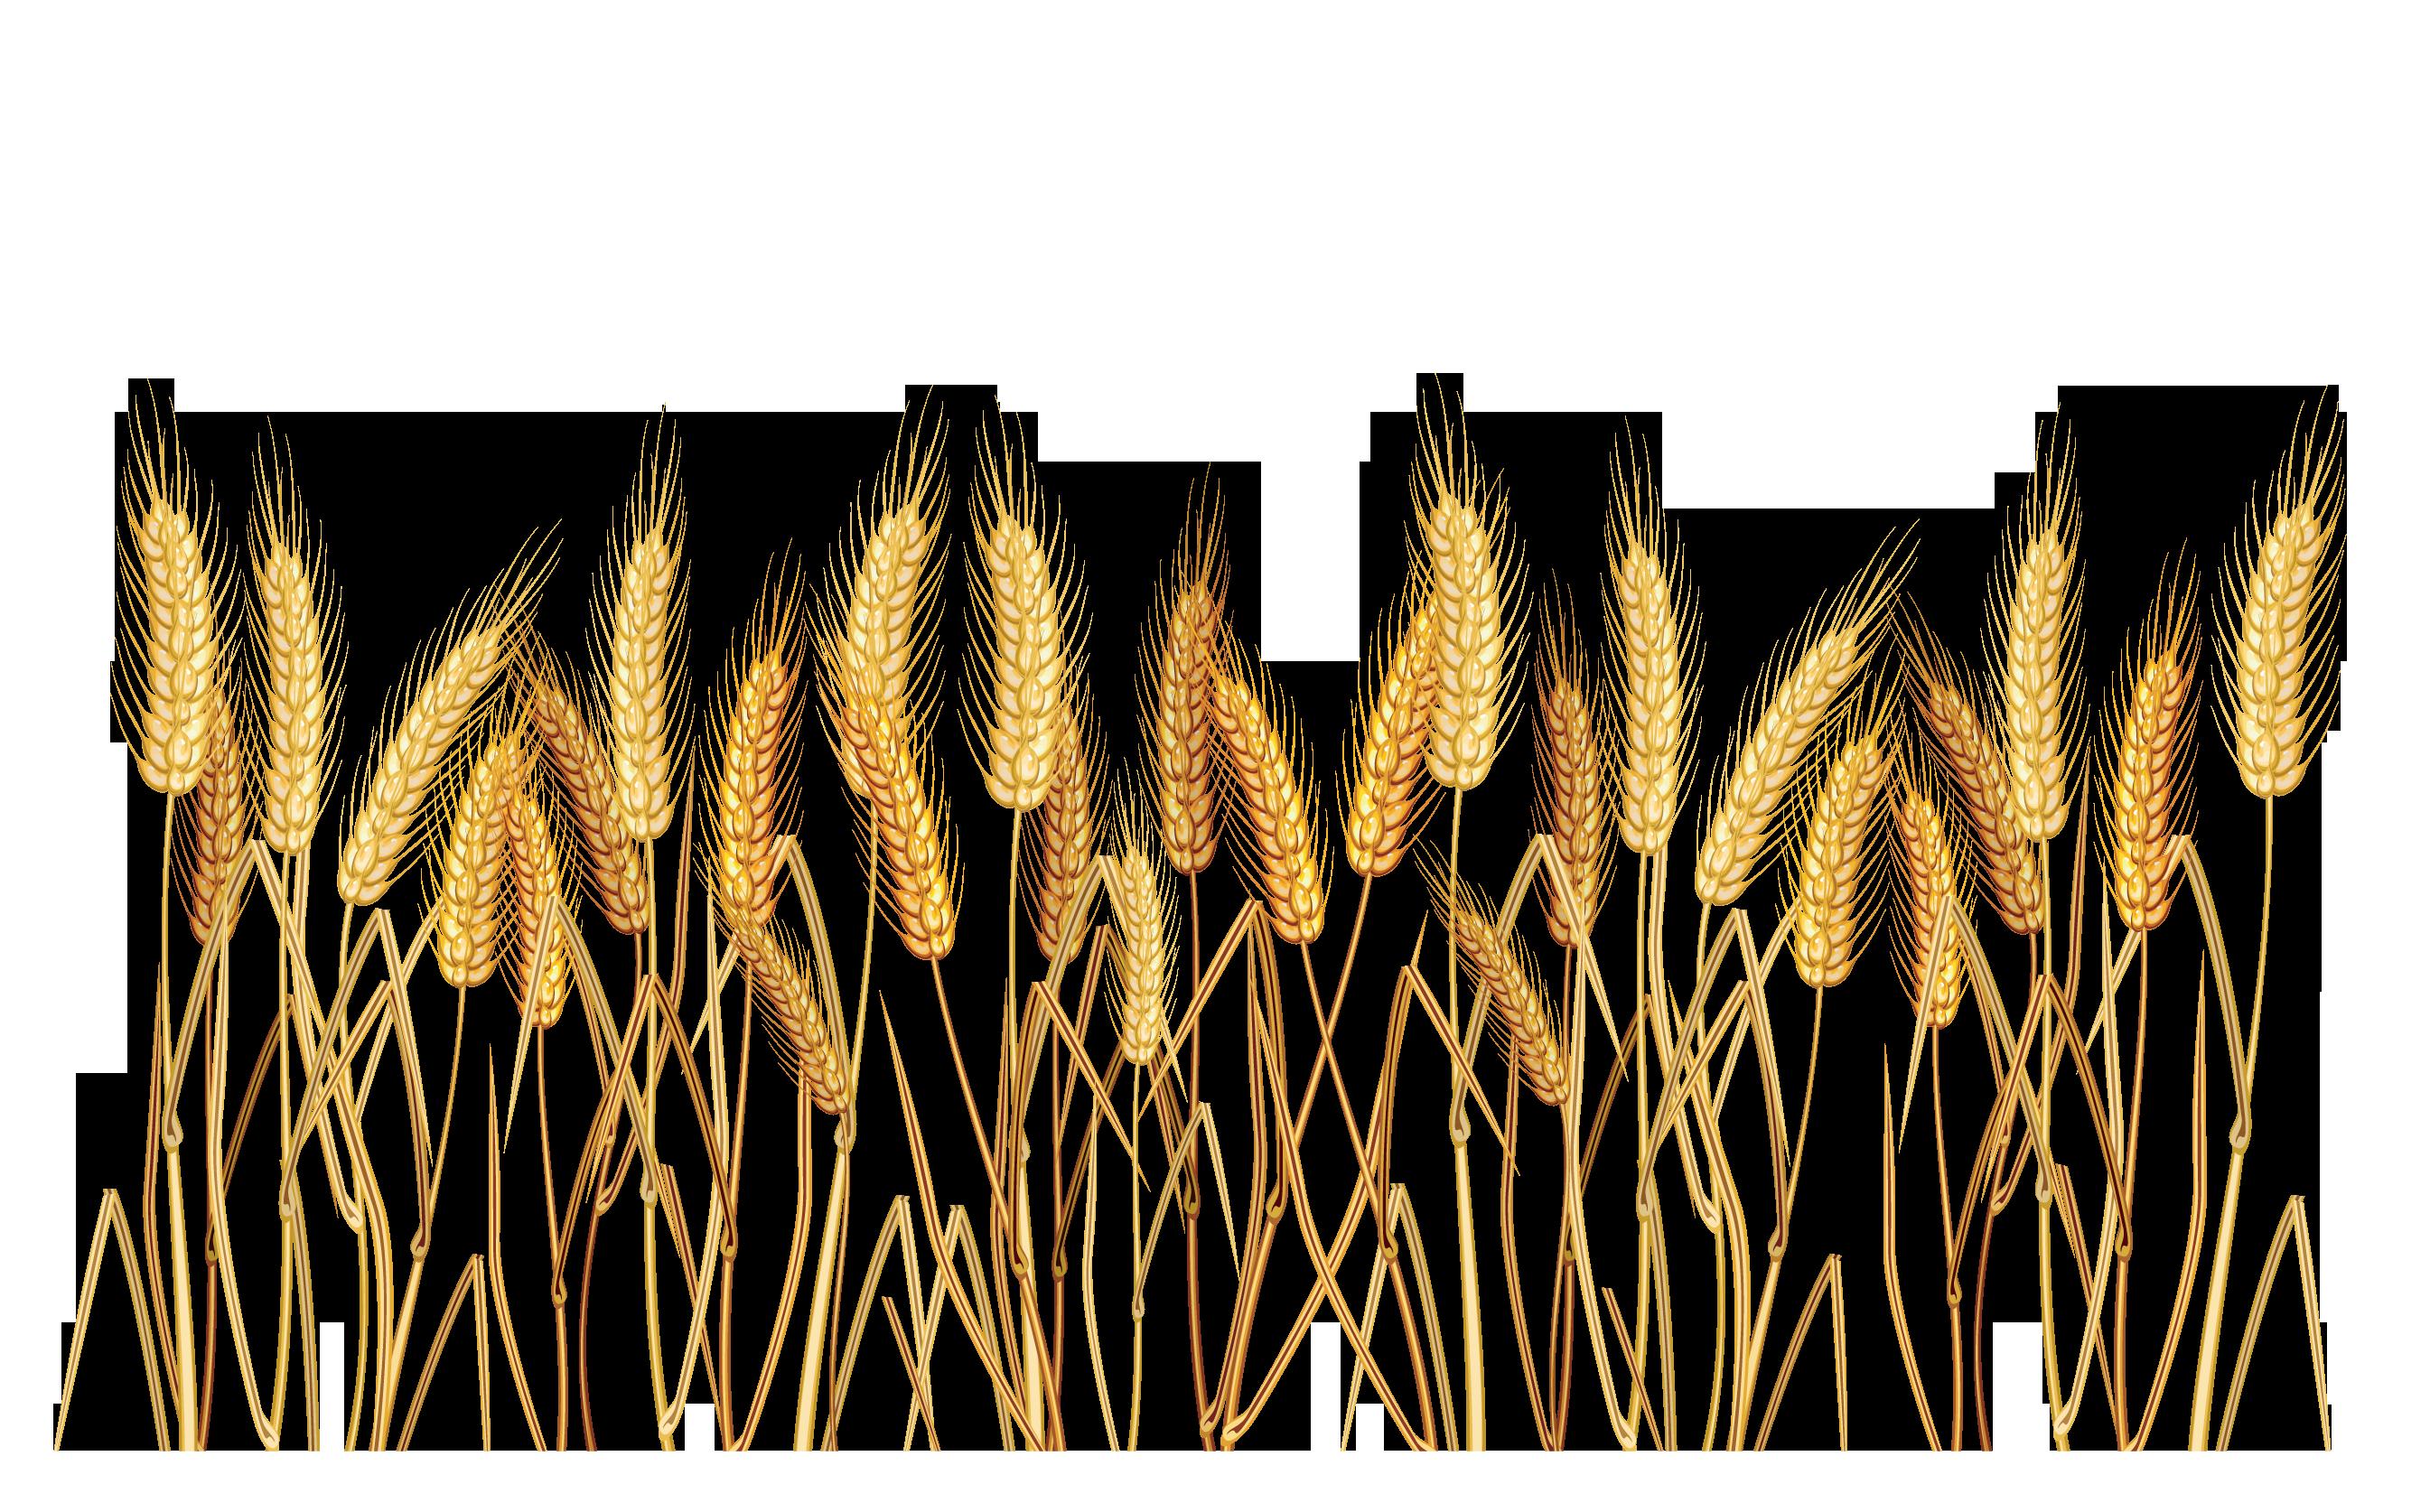 Clip art google search. Daisy clipart wheat grass